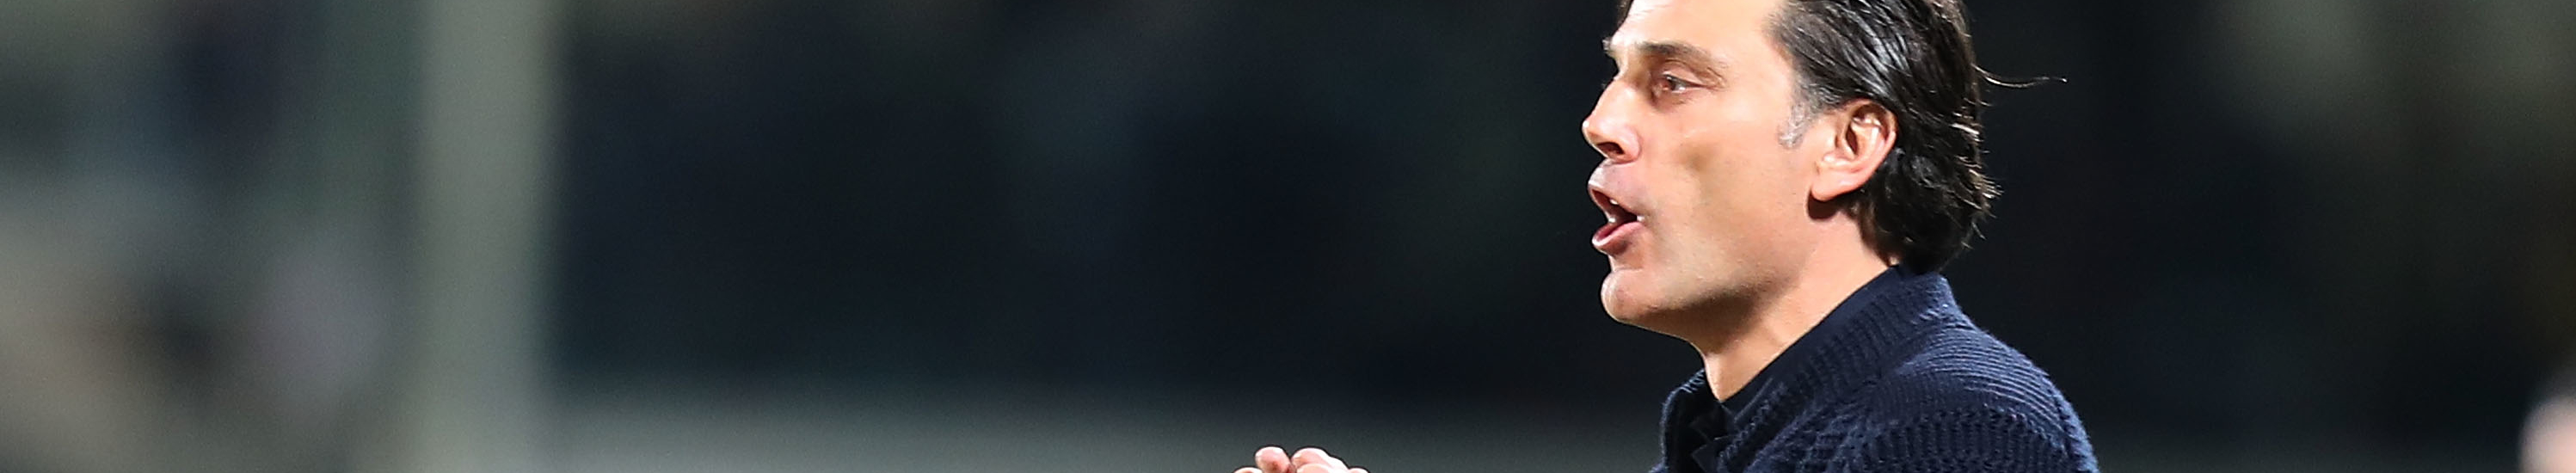 Fiorentina-Benfica: ultima in ICC per i viola, Chiesa in campo?